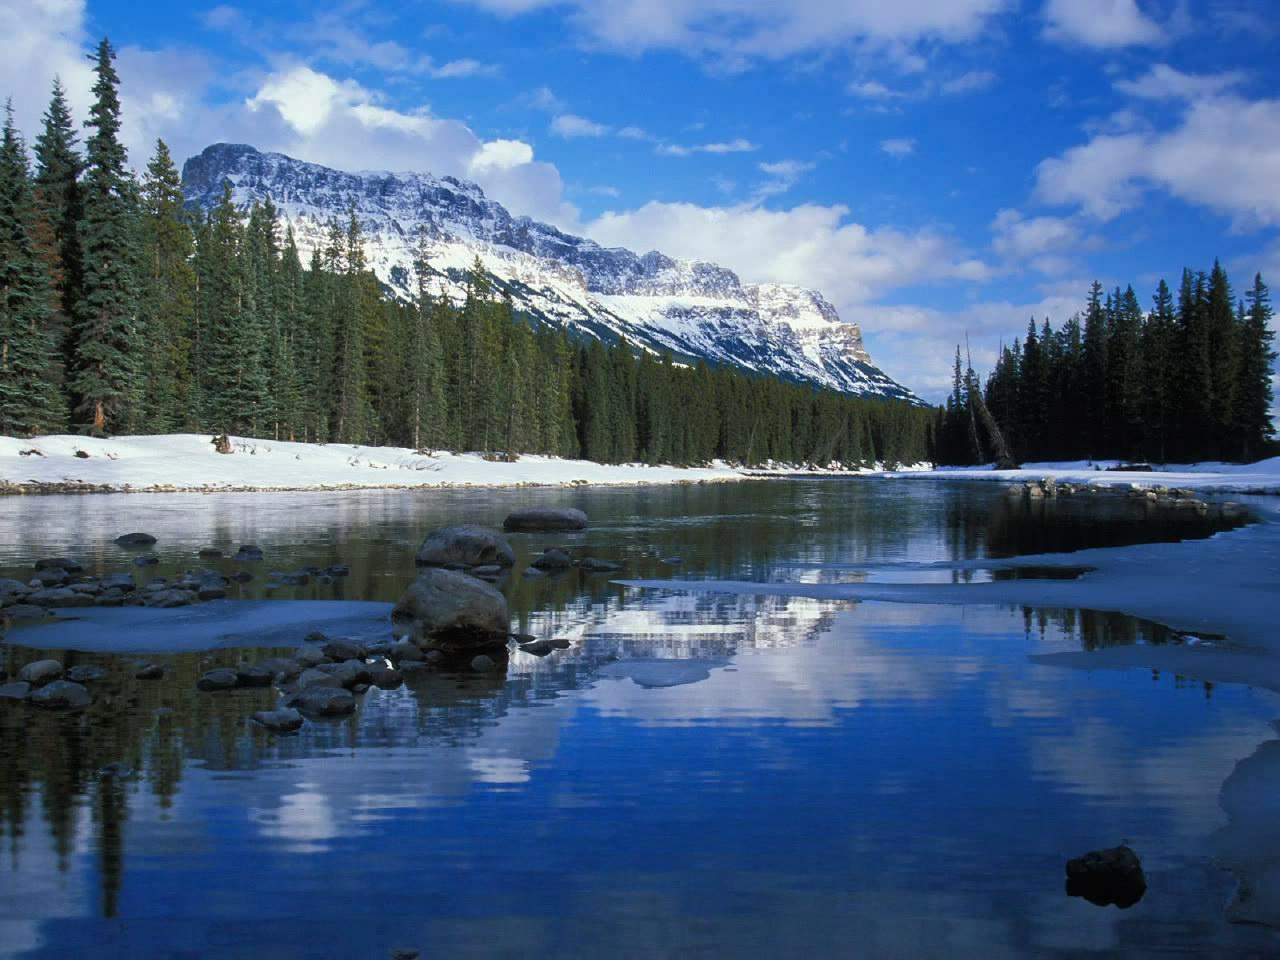 http://4.bp.blogspot.com/-HomayORnUxc/UB0CA8WrcdI/AAAAAAAACH8/fv1lG8uyiO4/s1600/Nature-Landscape-HD-Dream.jpg